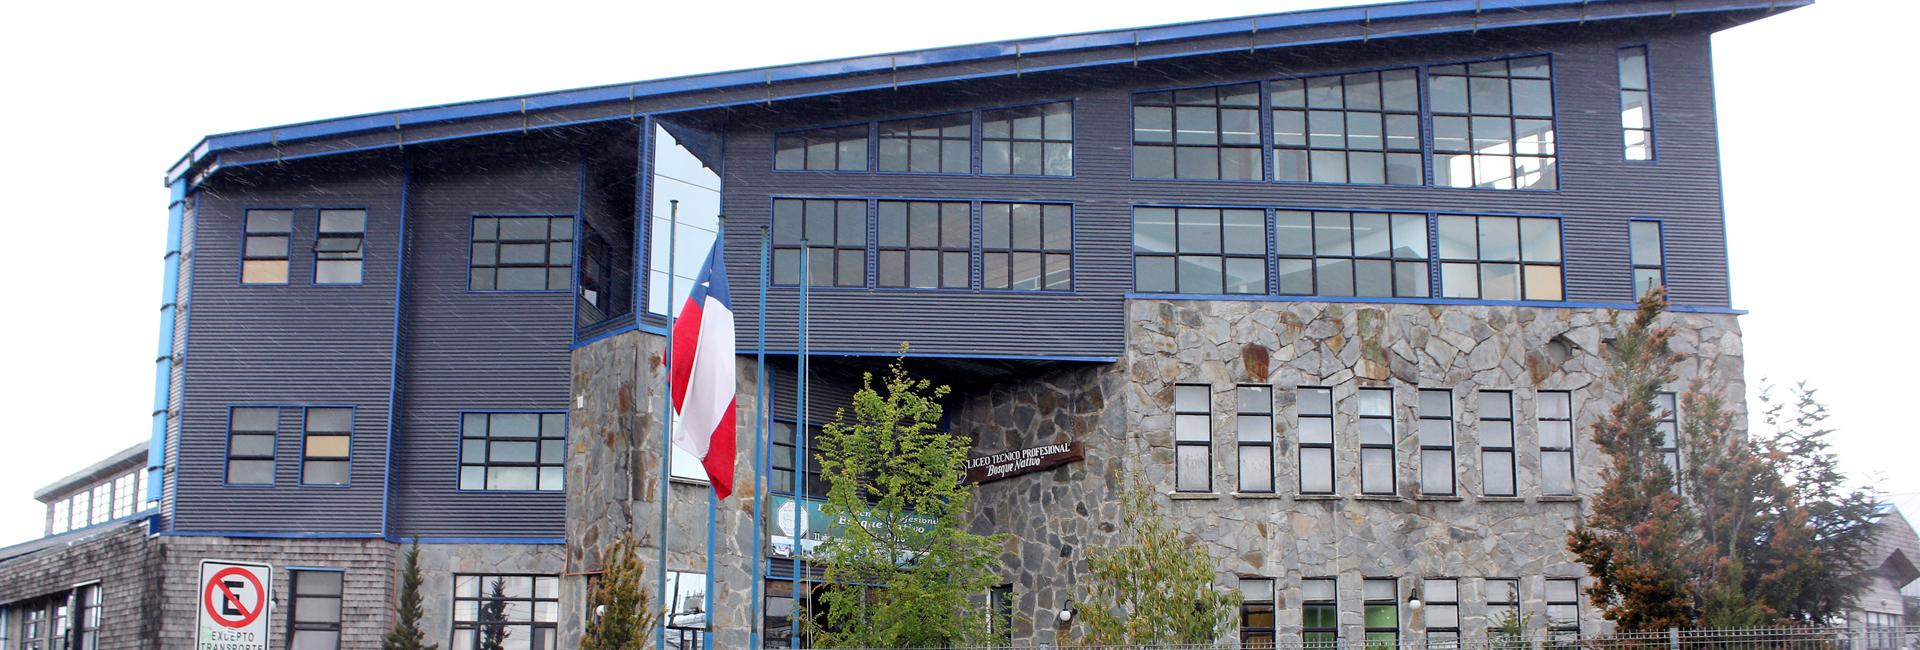 Liceo Bosque Nativo Puerto Montt